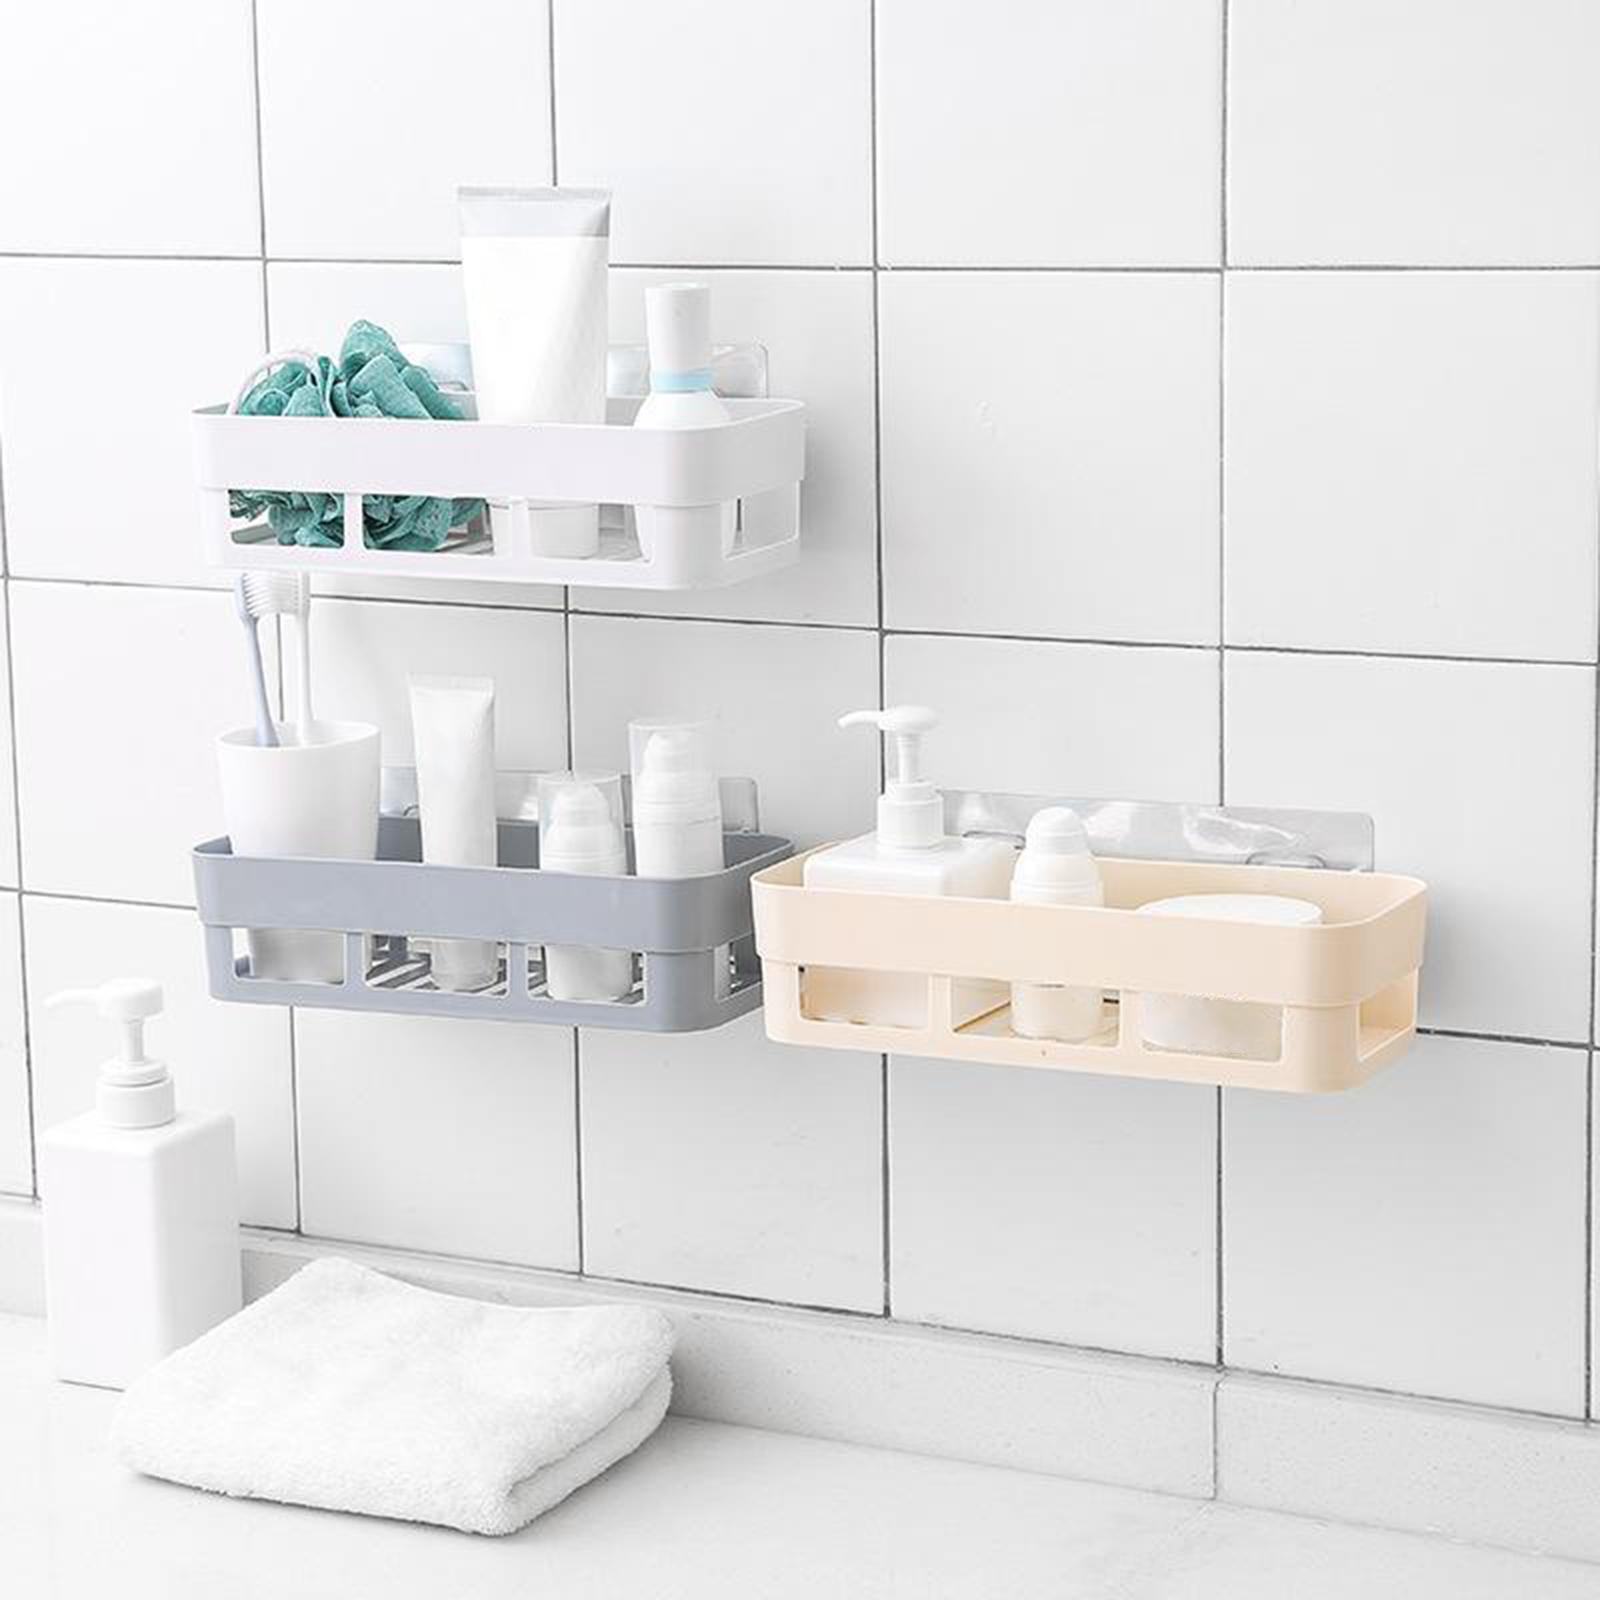 thumbnail 16 - Wall-Suction-Bathroom-Shelf-Shower-Caddy-Wall-Mount-Storage-Rack-Organizer